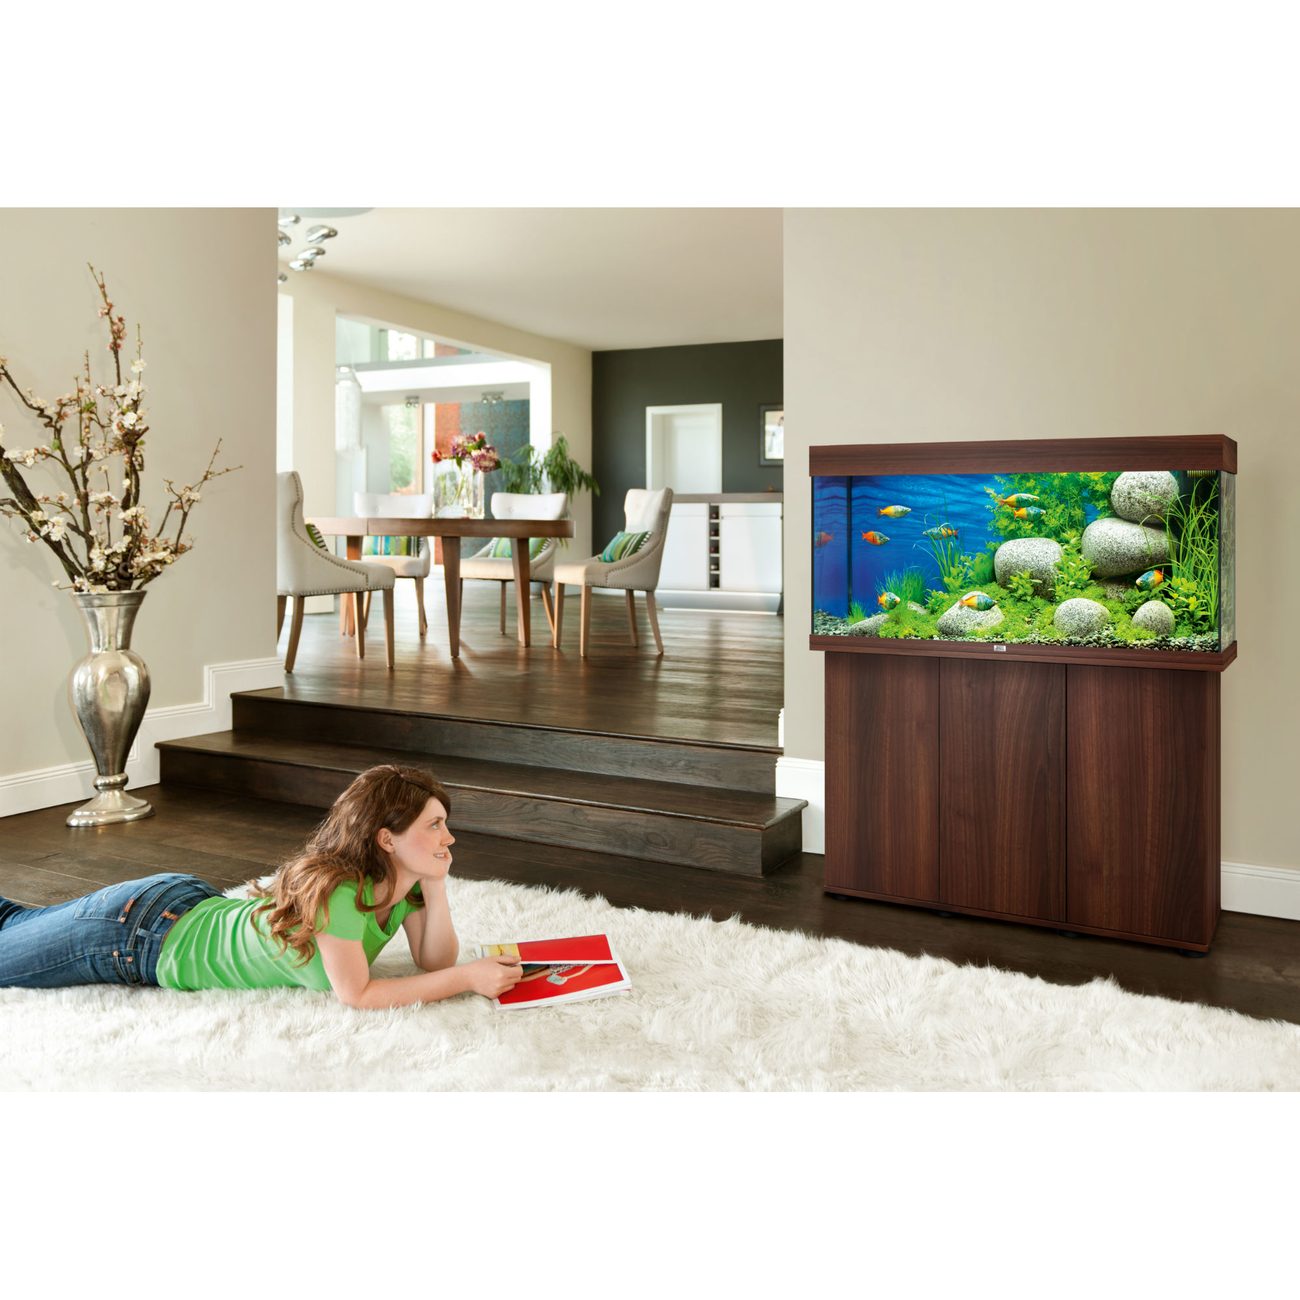 Juwel Rio 180 LED Aquarium mit Unterschrank SBX, Bild 11